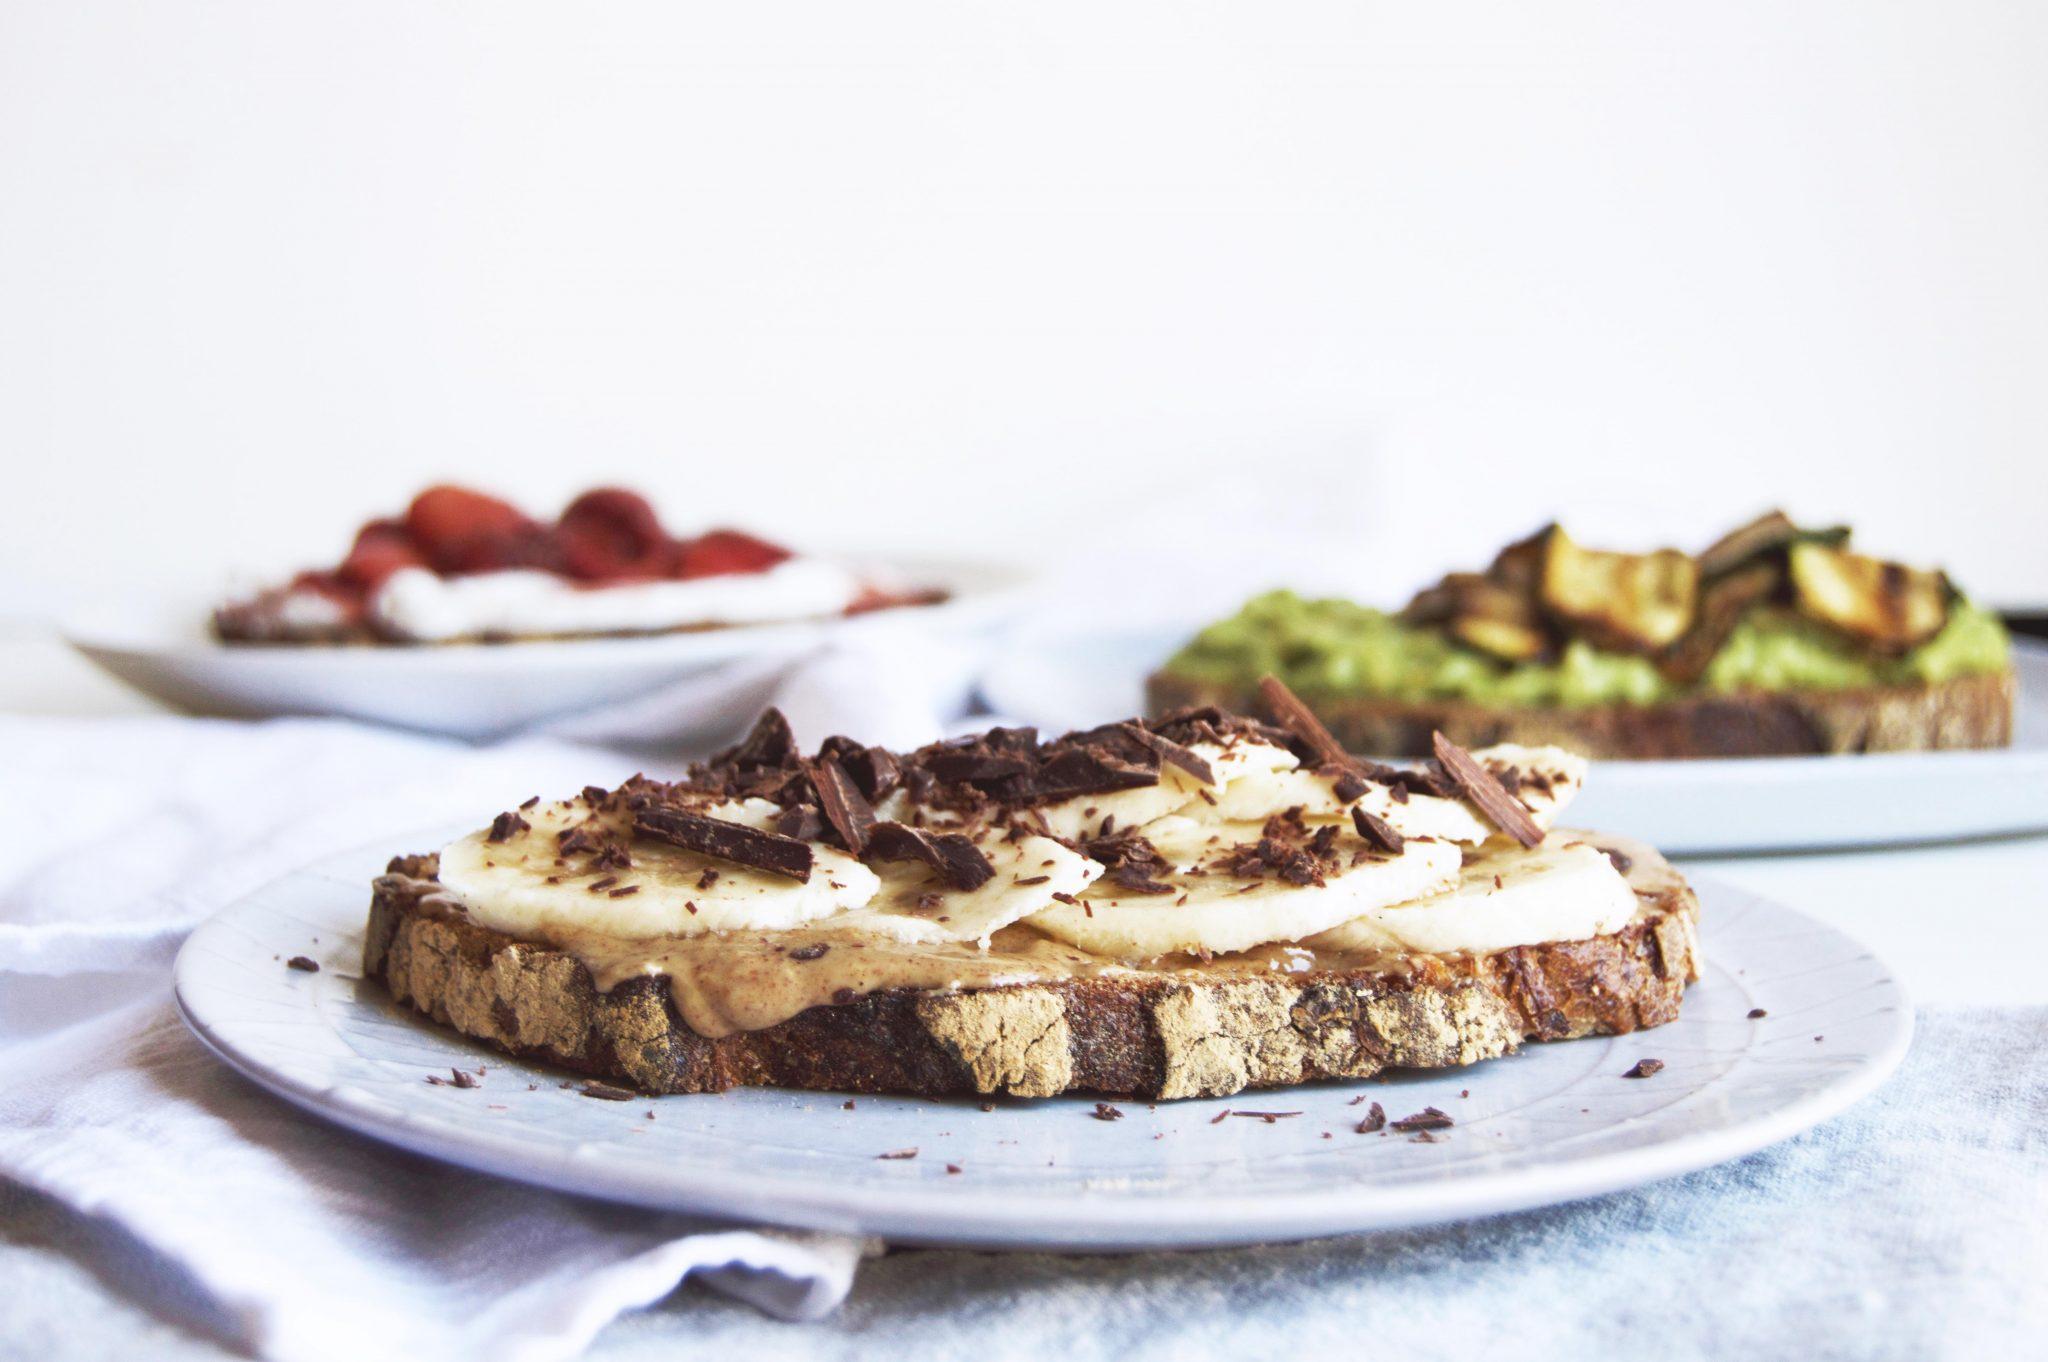 Delicious Quick & Easy Vegan Sourdough Sandwiches - 4 Ways